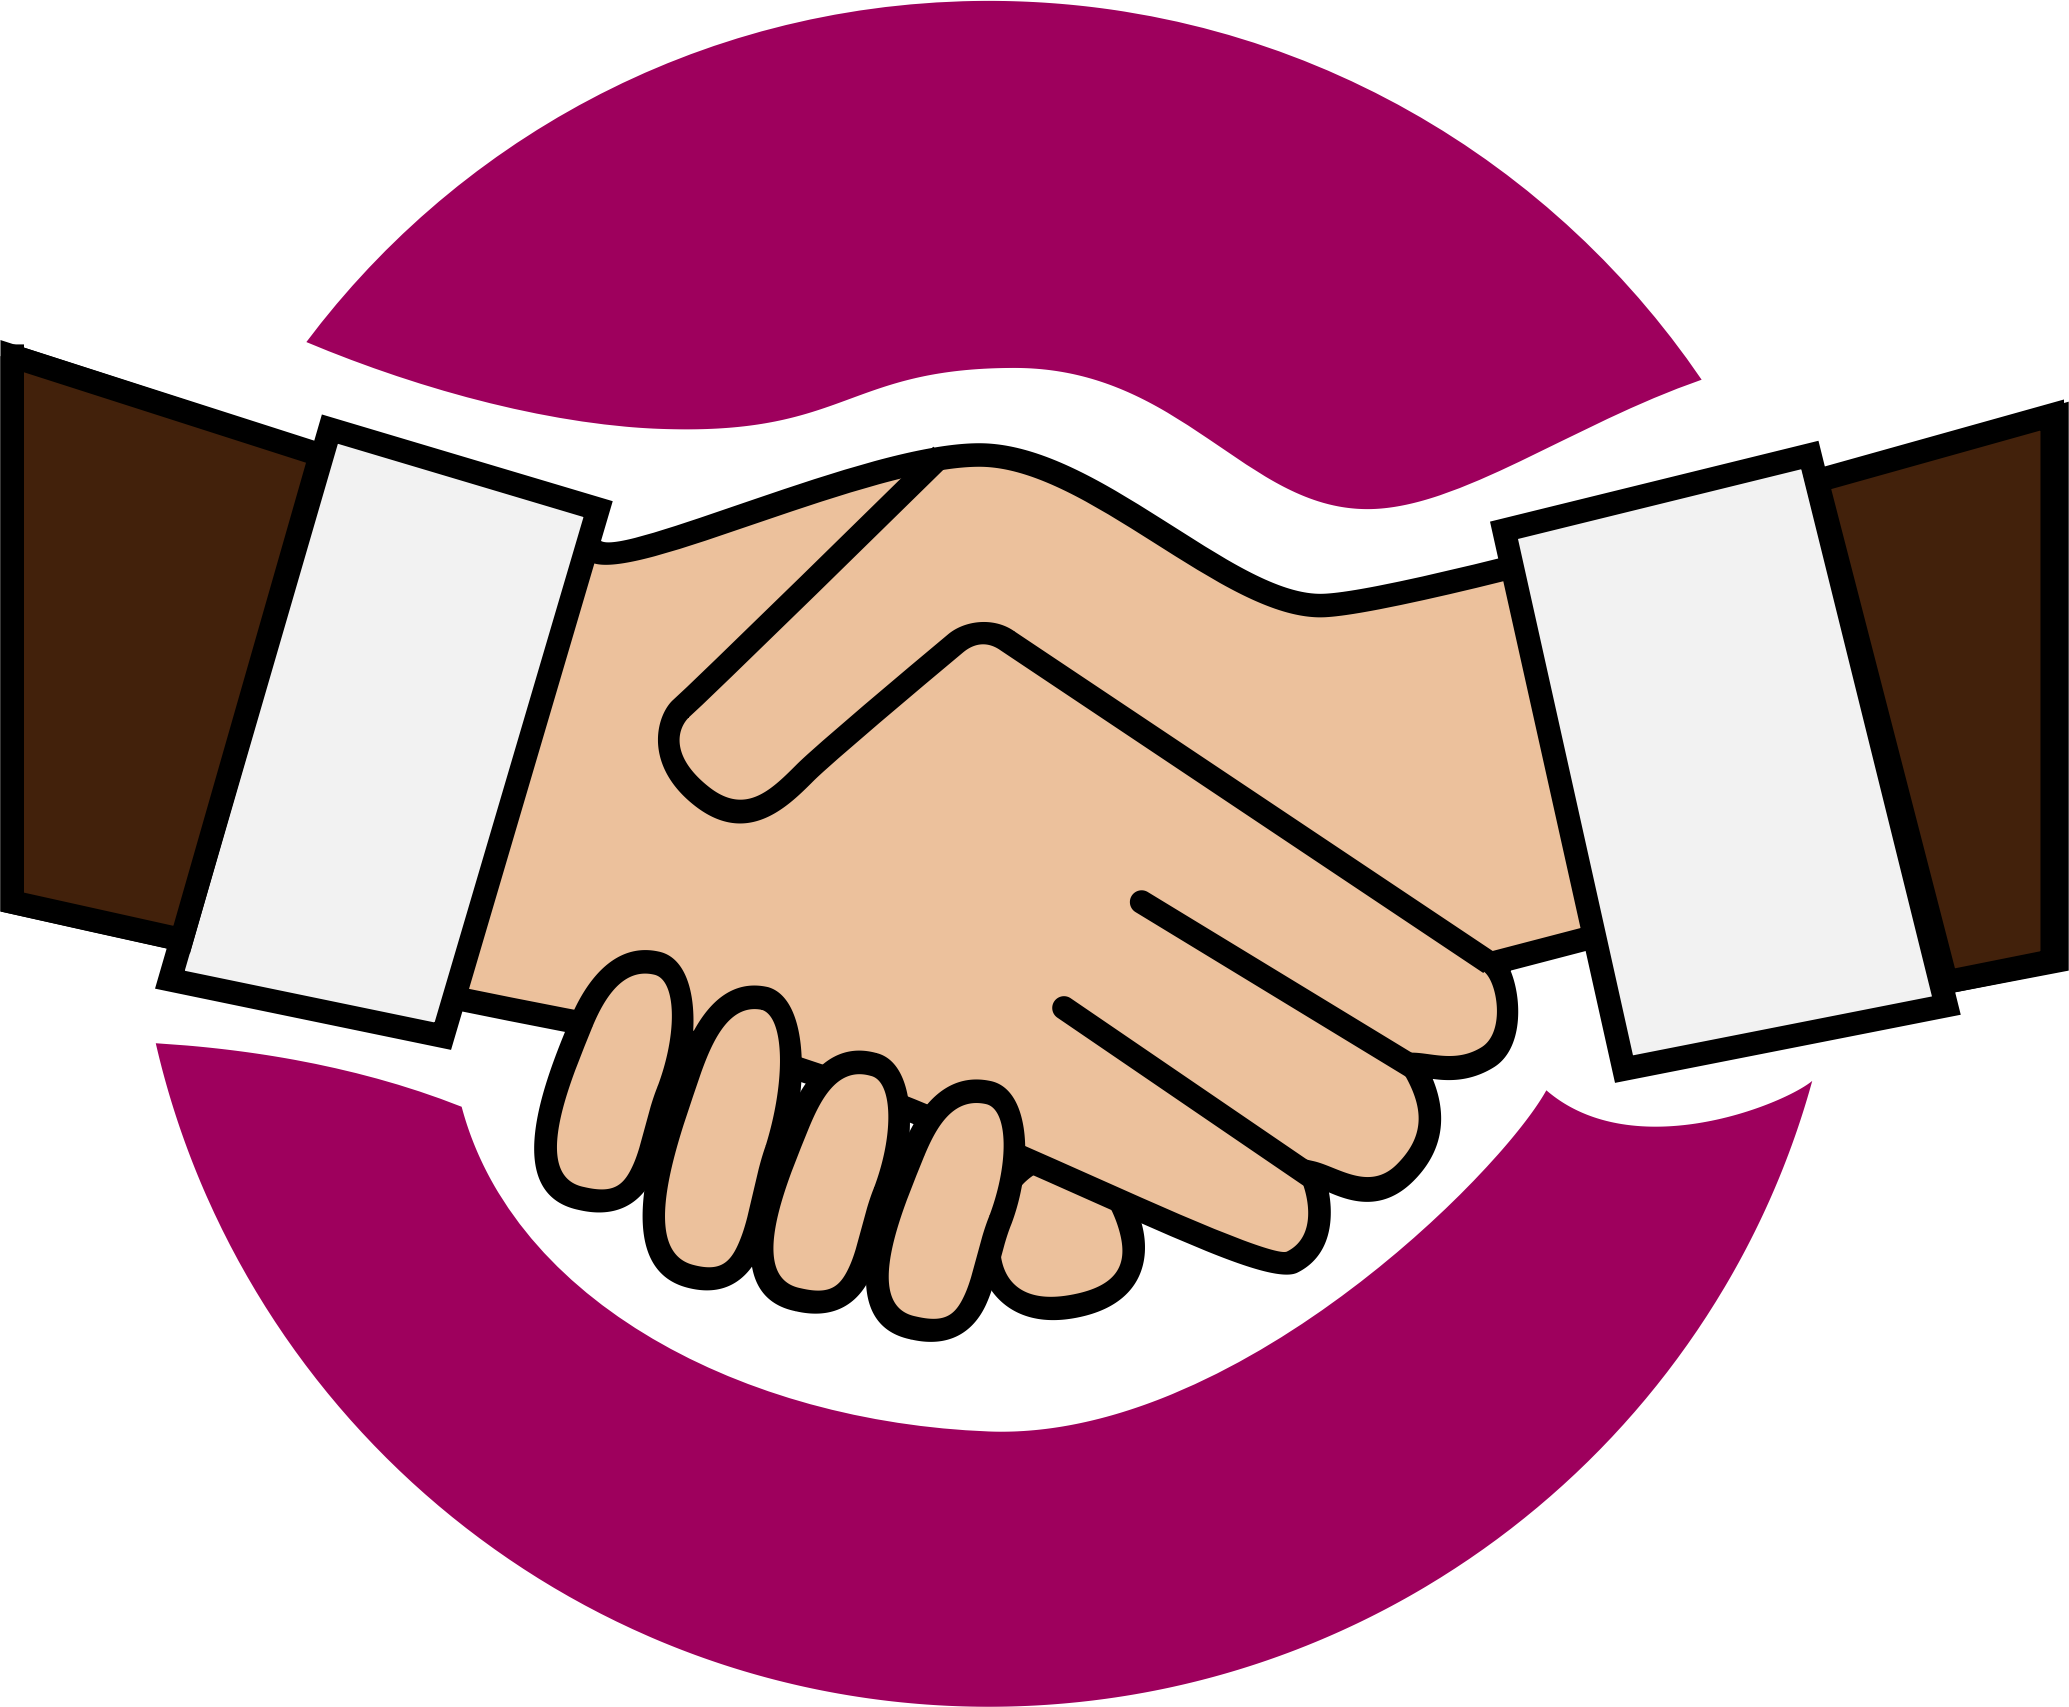 Friendship Handshake Clipart-Friendship Handshake Clipart-3